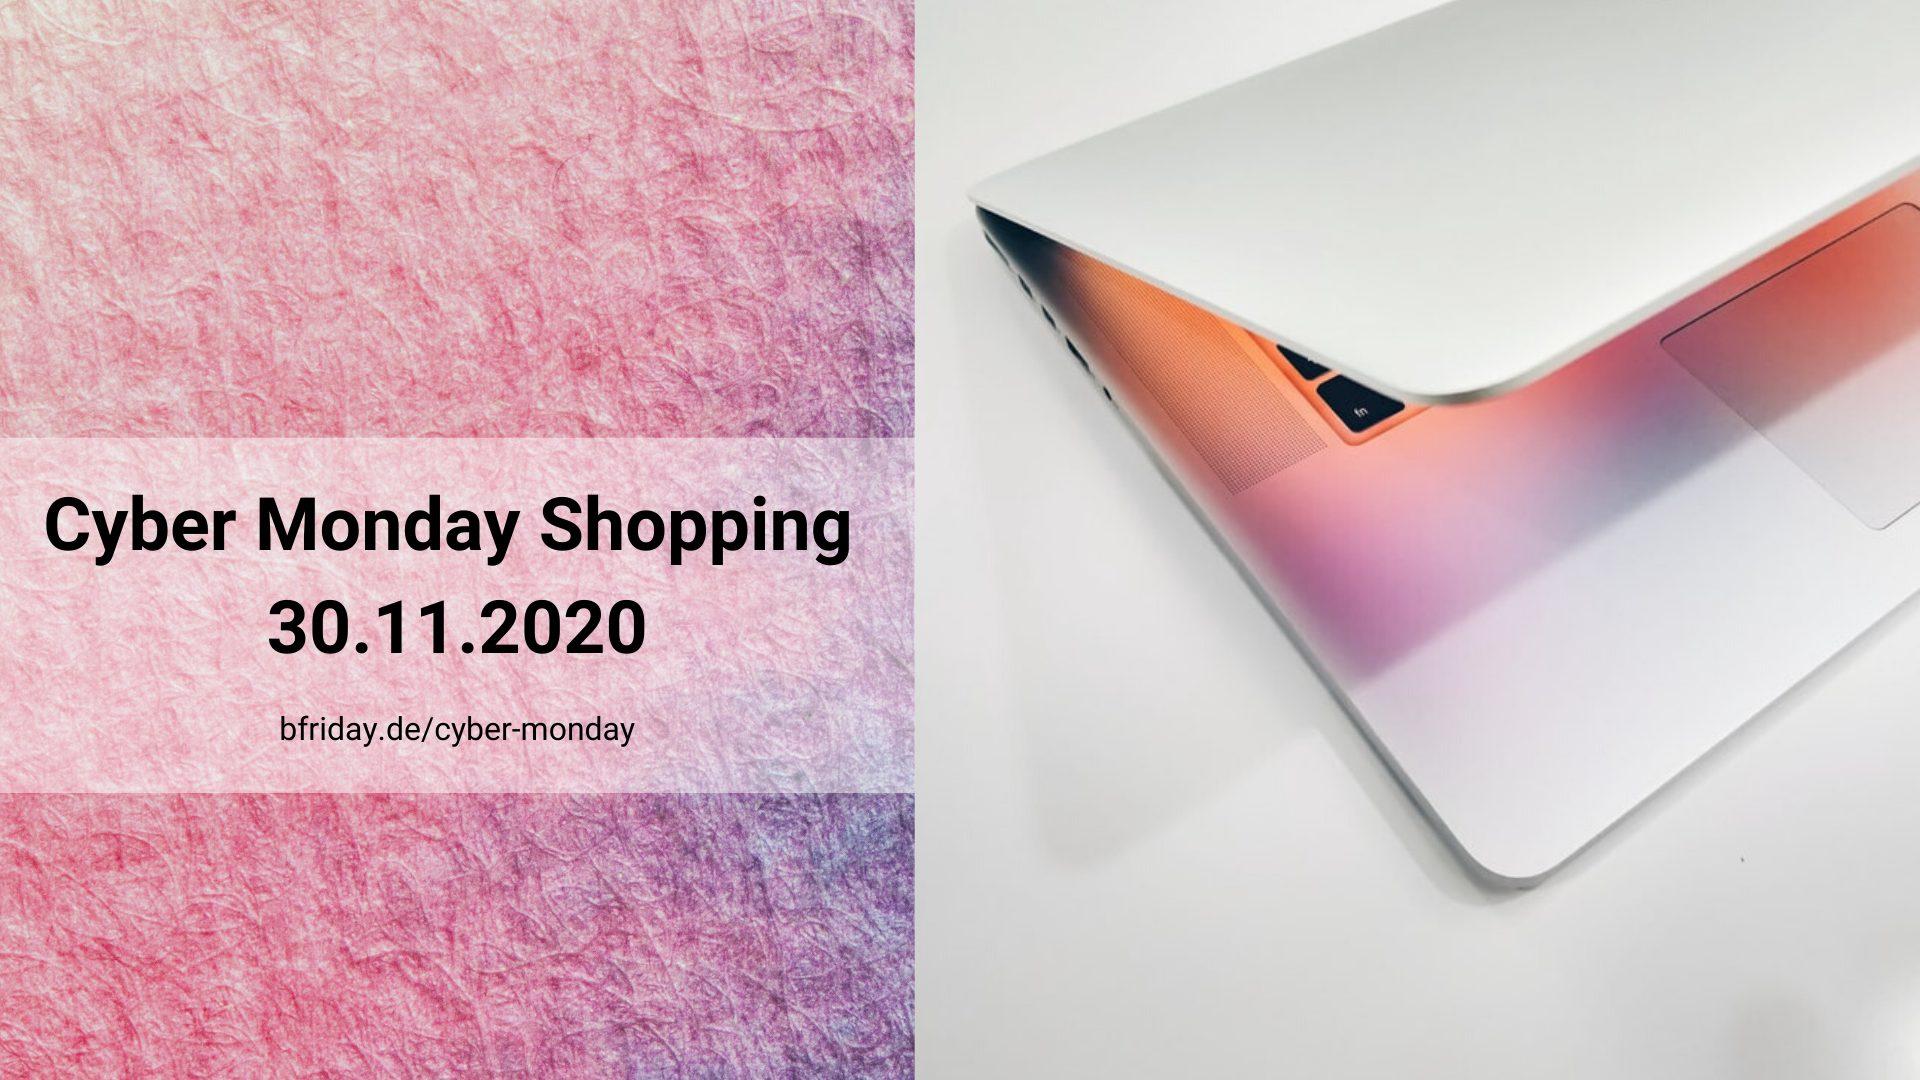 Cyber Monday Shopping 2020